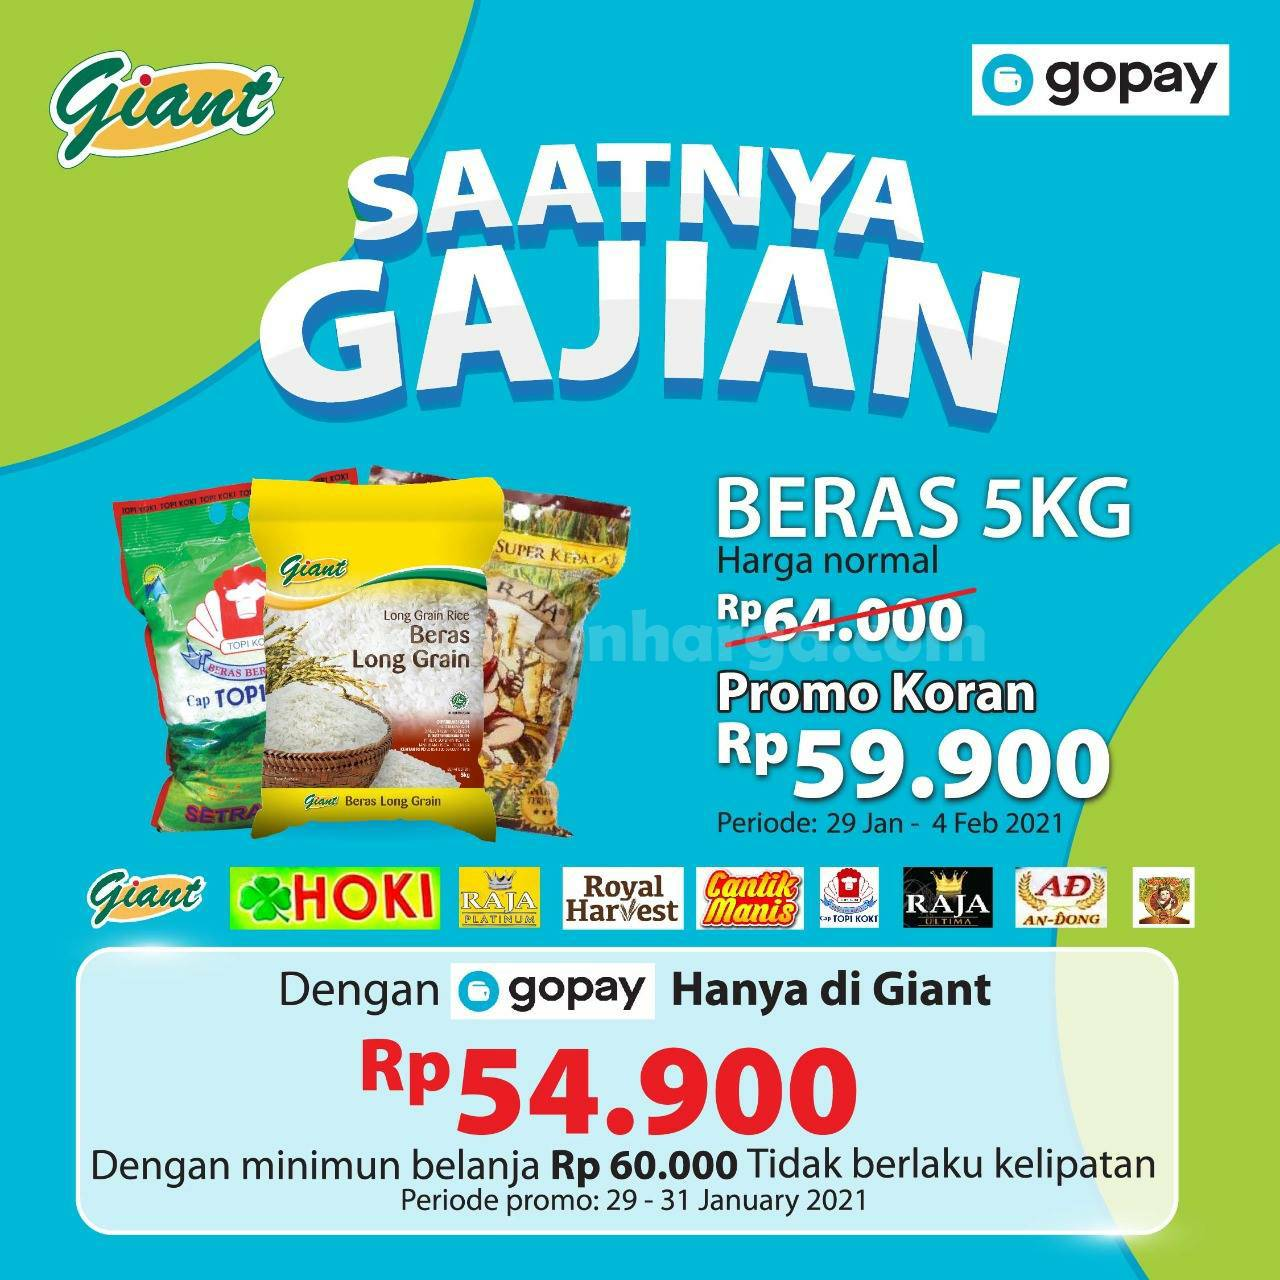 GIANT Promo Spesial GAJIAN! DISKON Aneka Beras 5 Kg hanya Rp 54.900